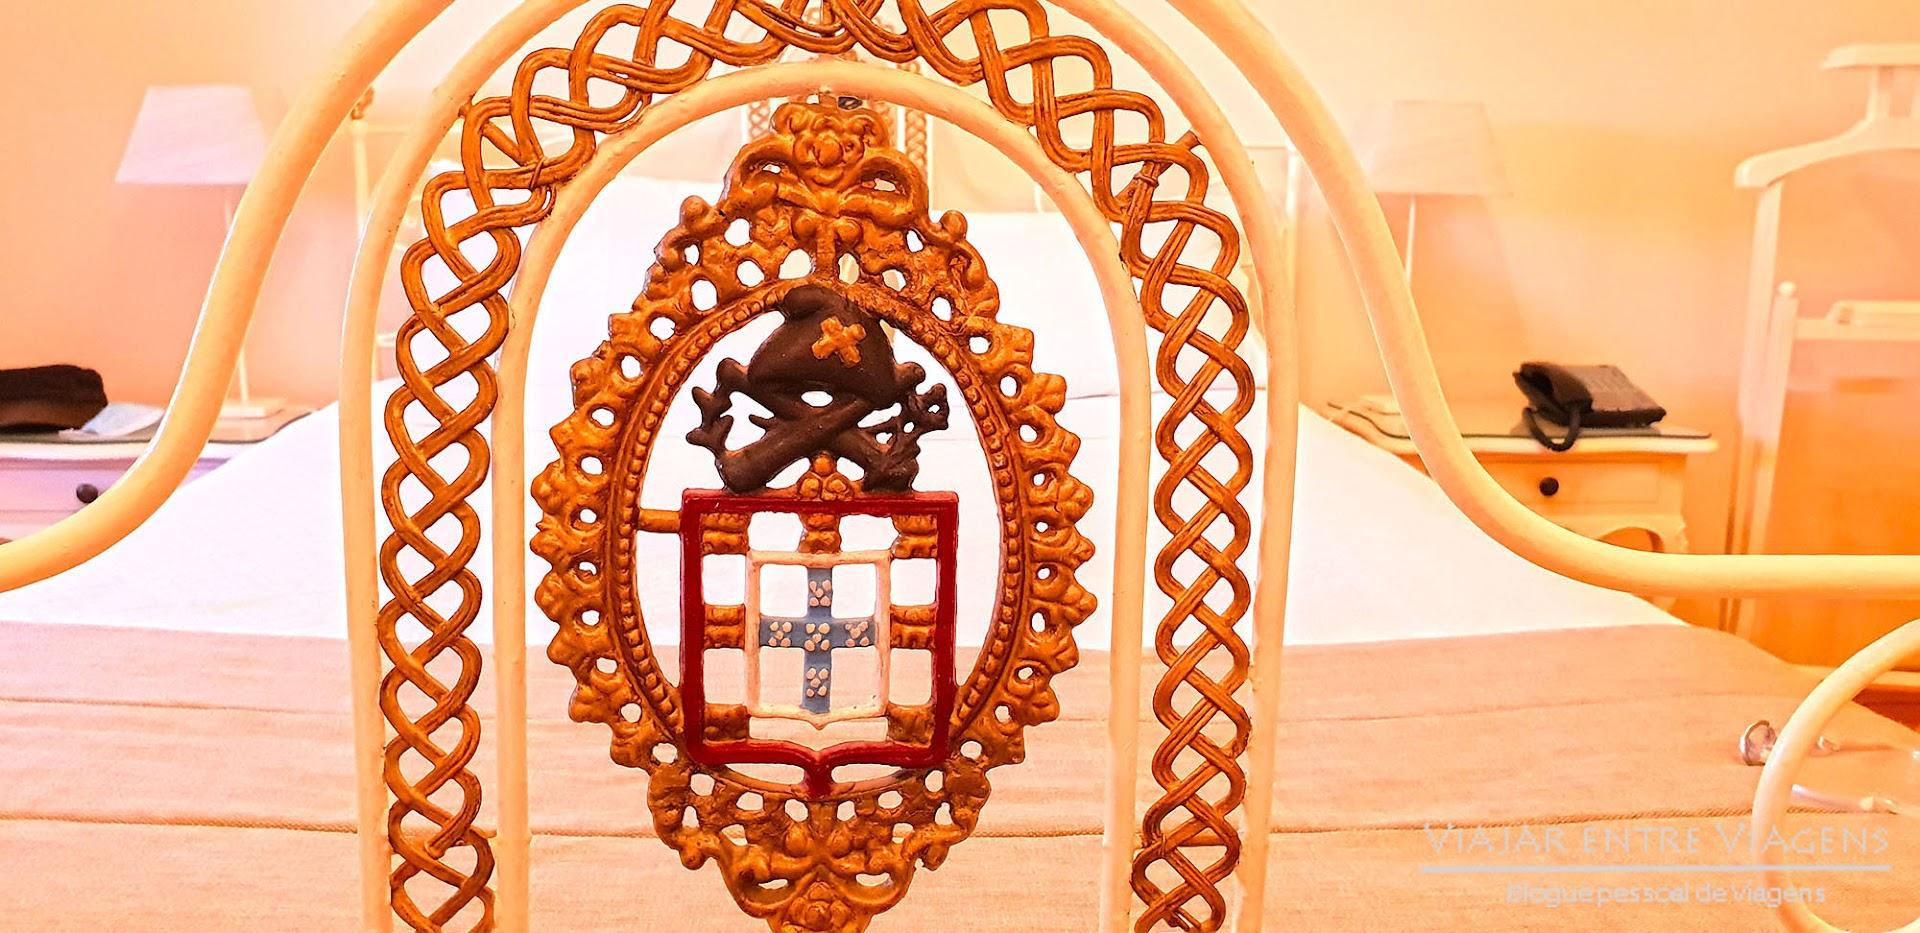 VILA VIÇOSA - ALENTEJO | O que visitar e fazer nas terras da Casa Real